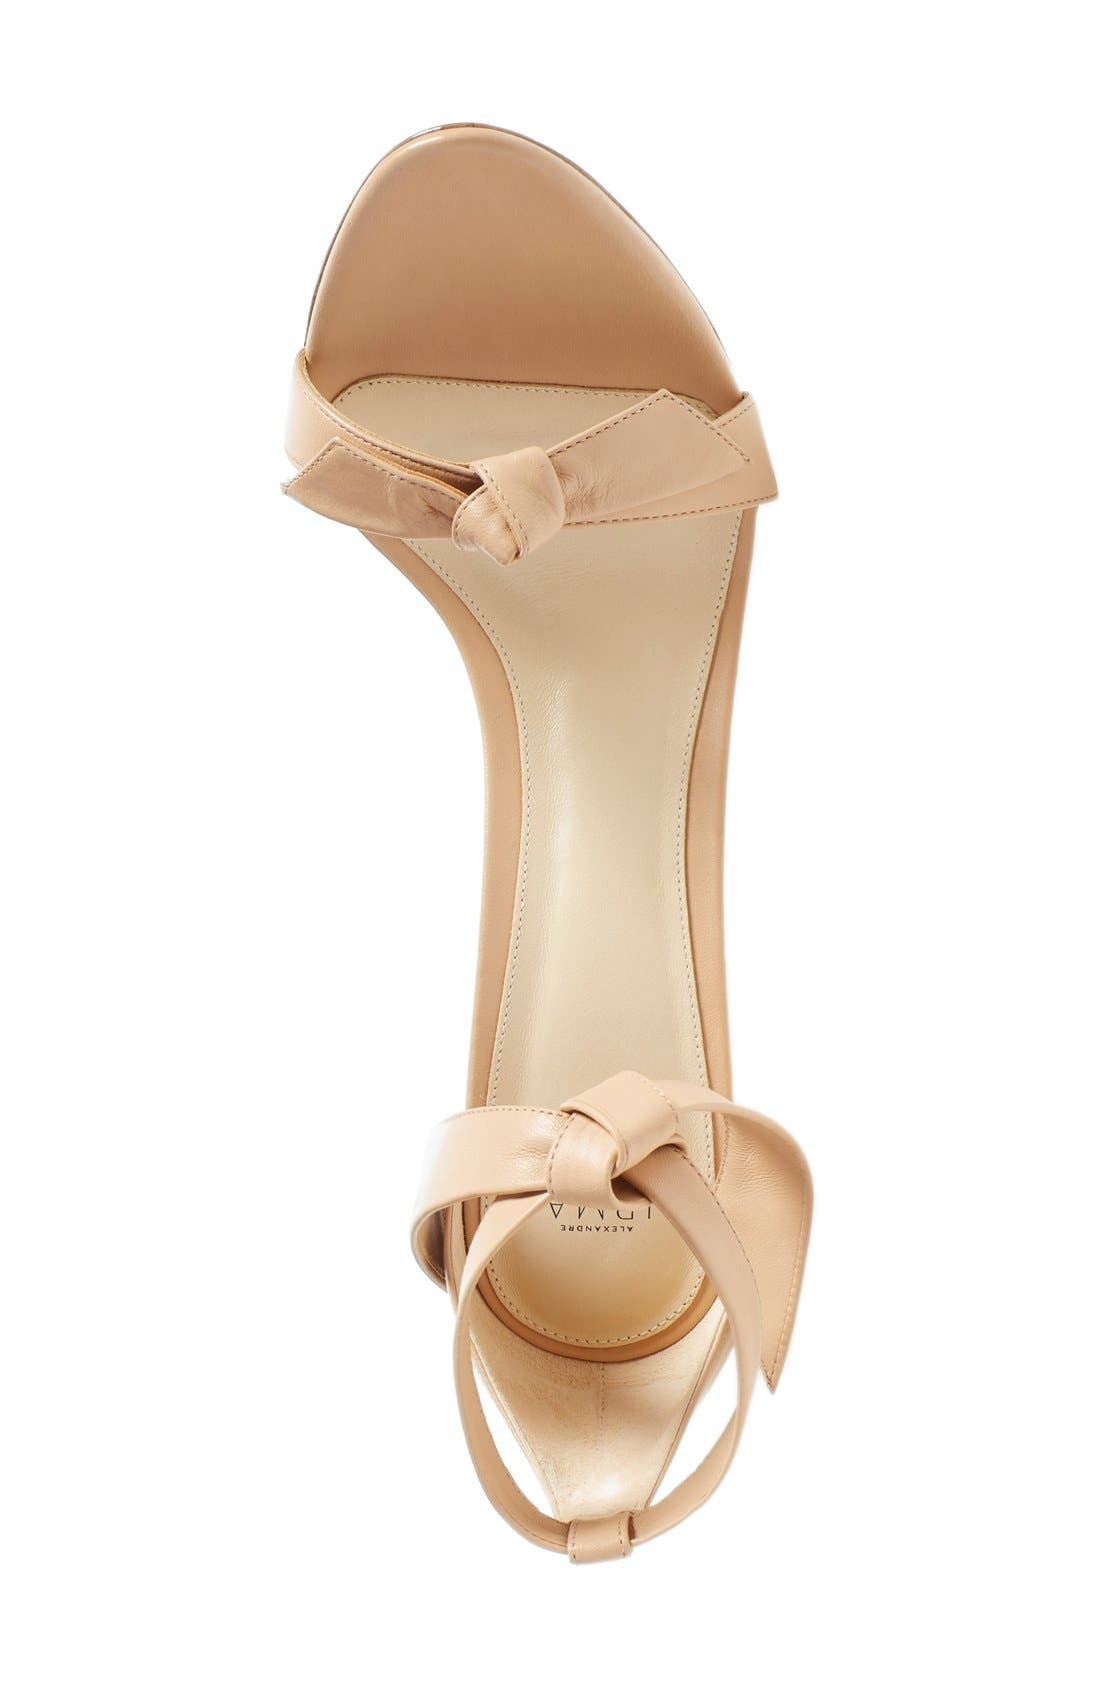 'Clarita' Ankle Tie Sandal,                             Alternate thumbnail 3, color,                             Nude Soft Leather